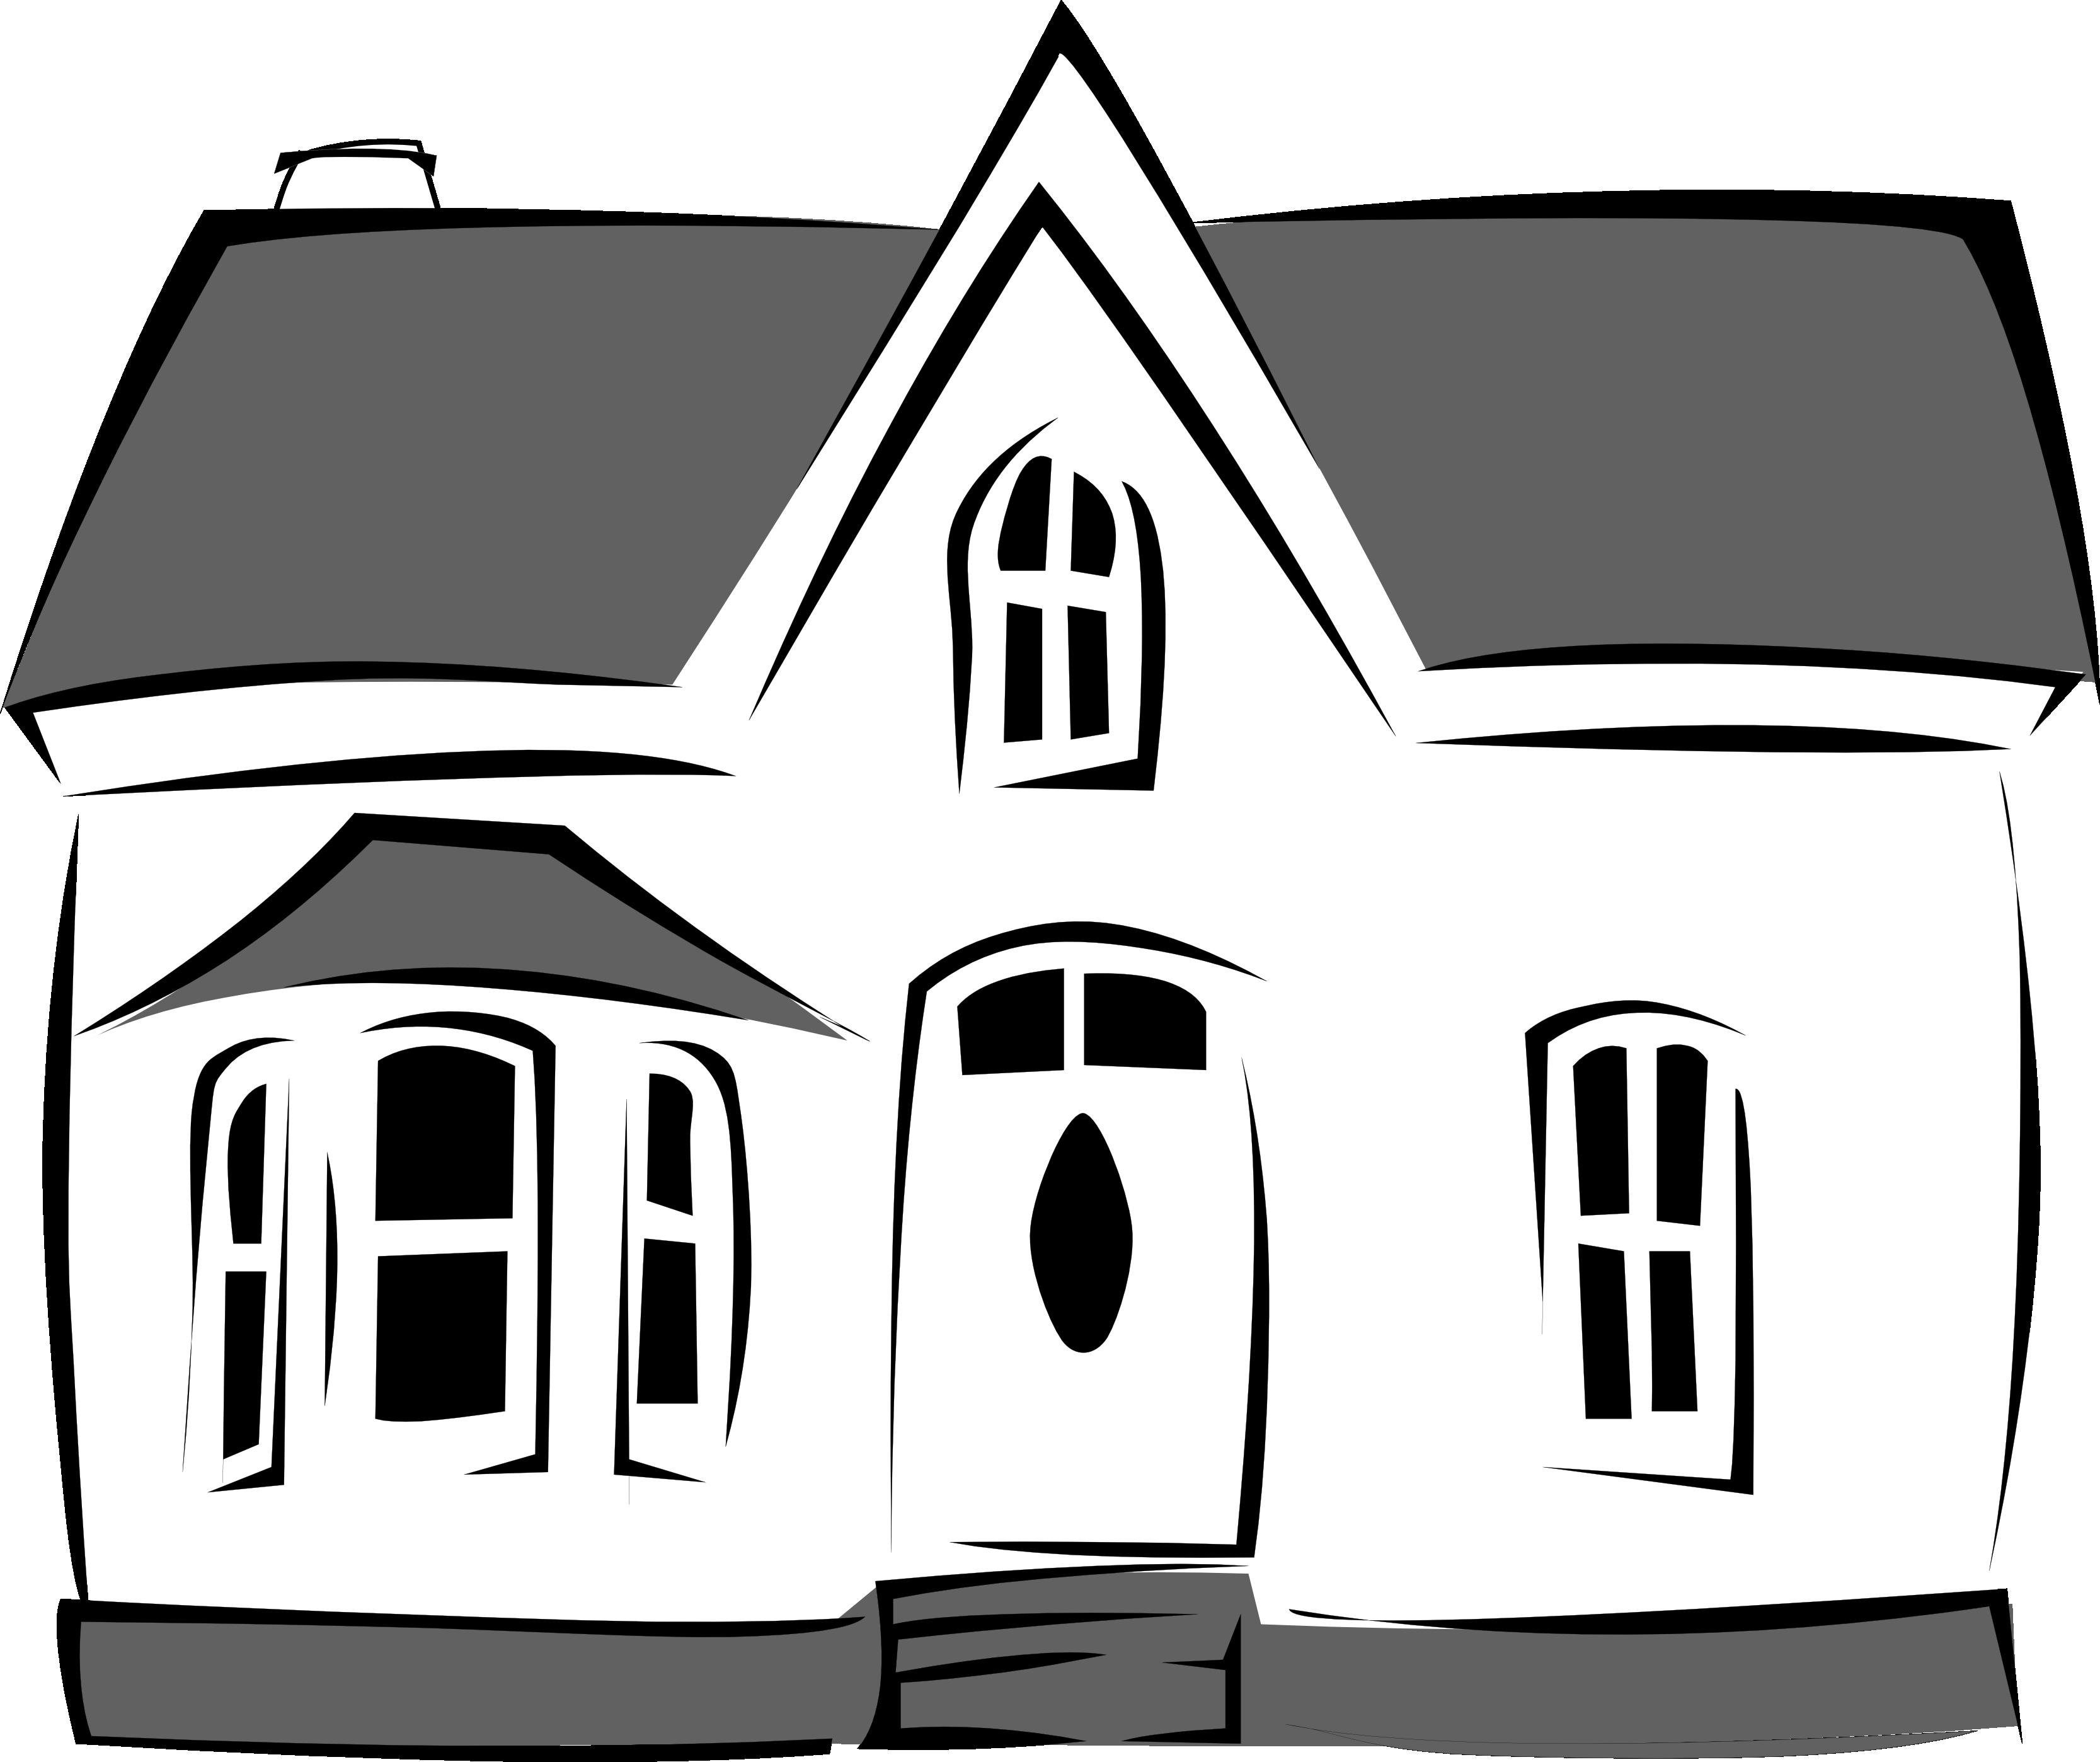 Clipart houses emoji. Cartoon house black and